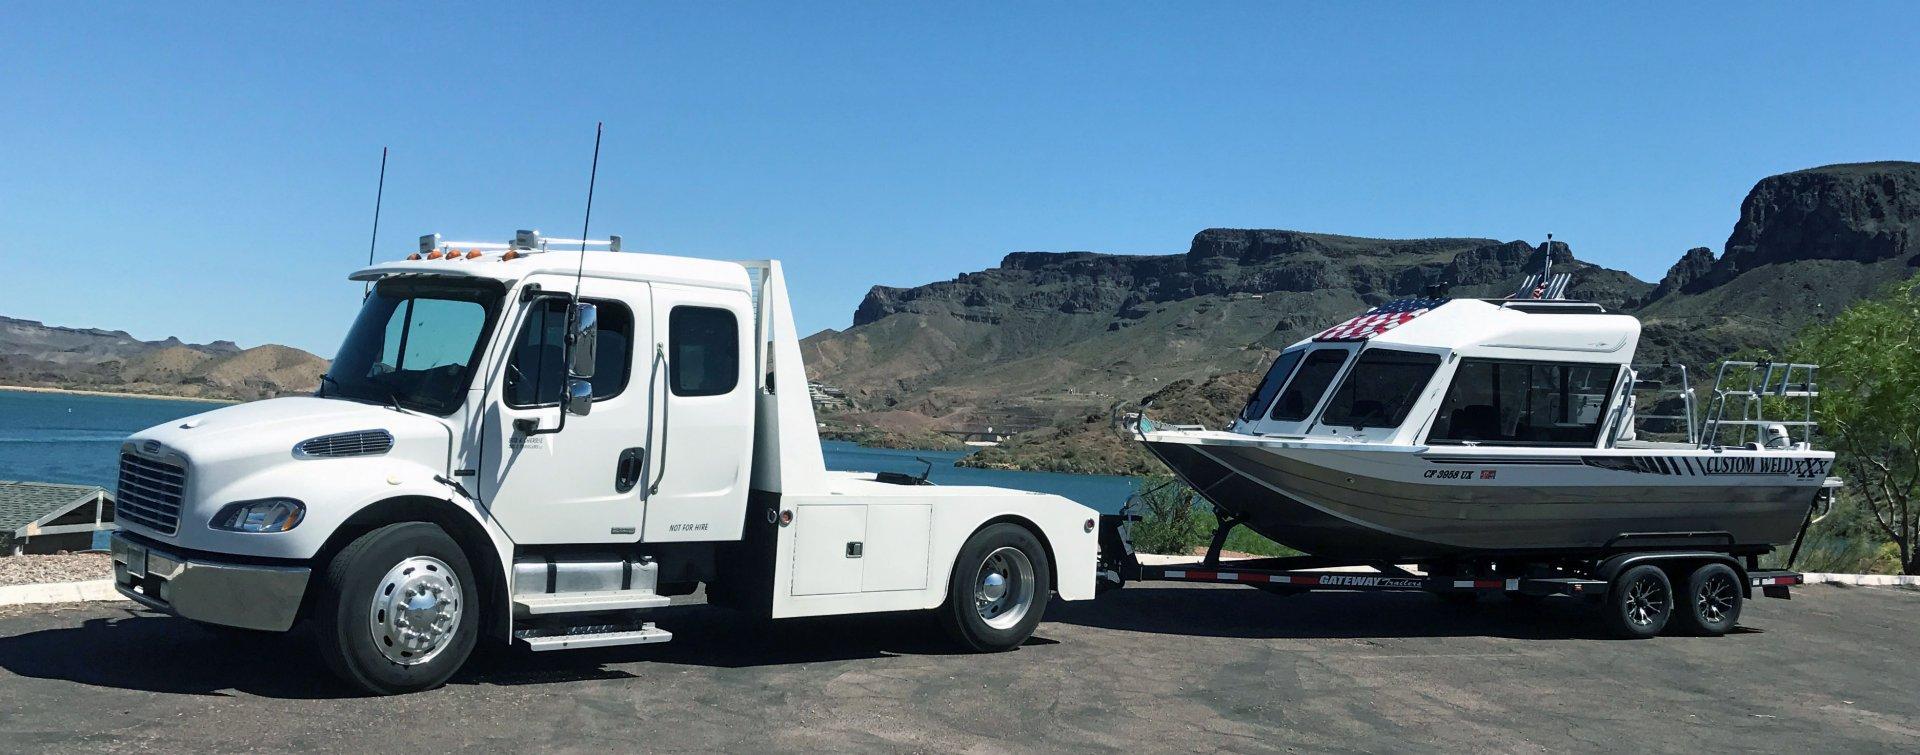 Truck&Boat 2.jpg